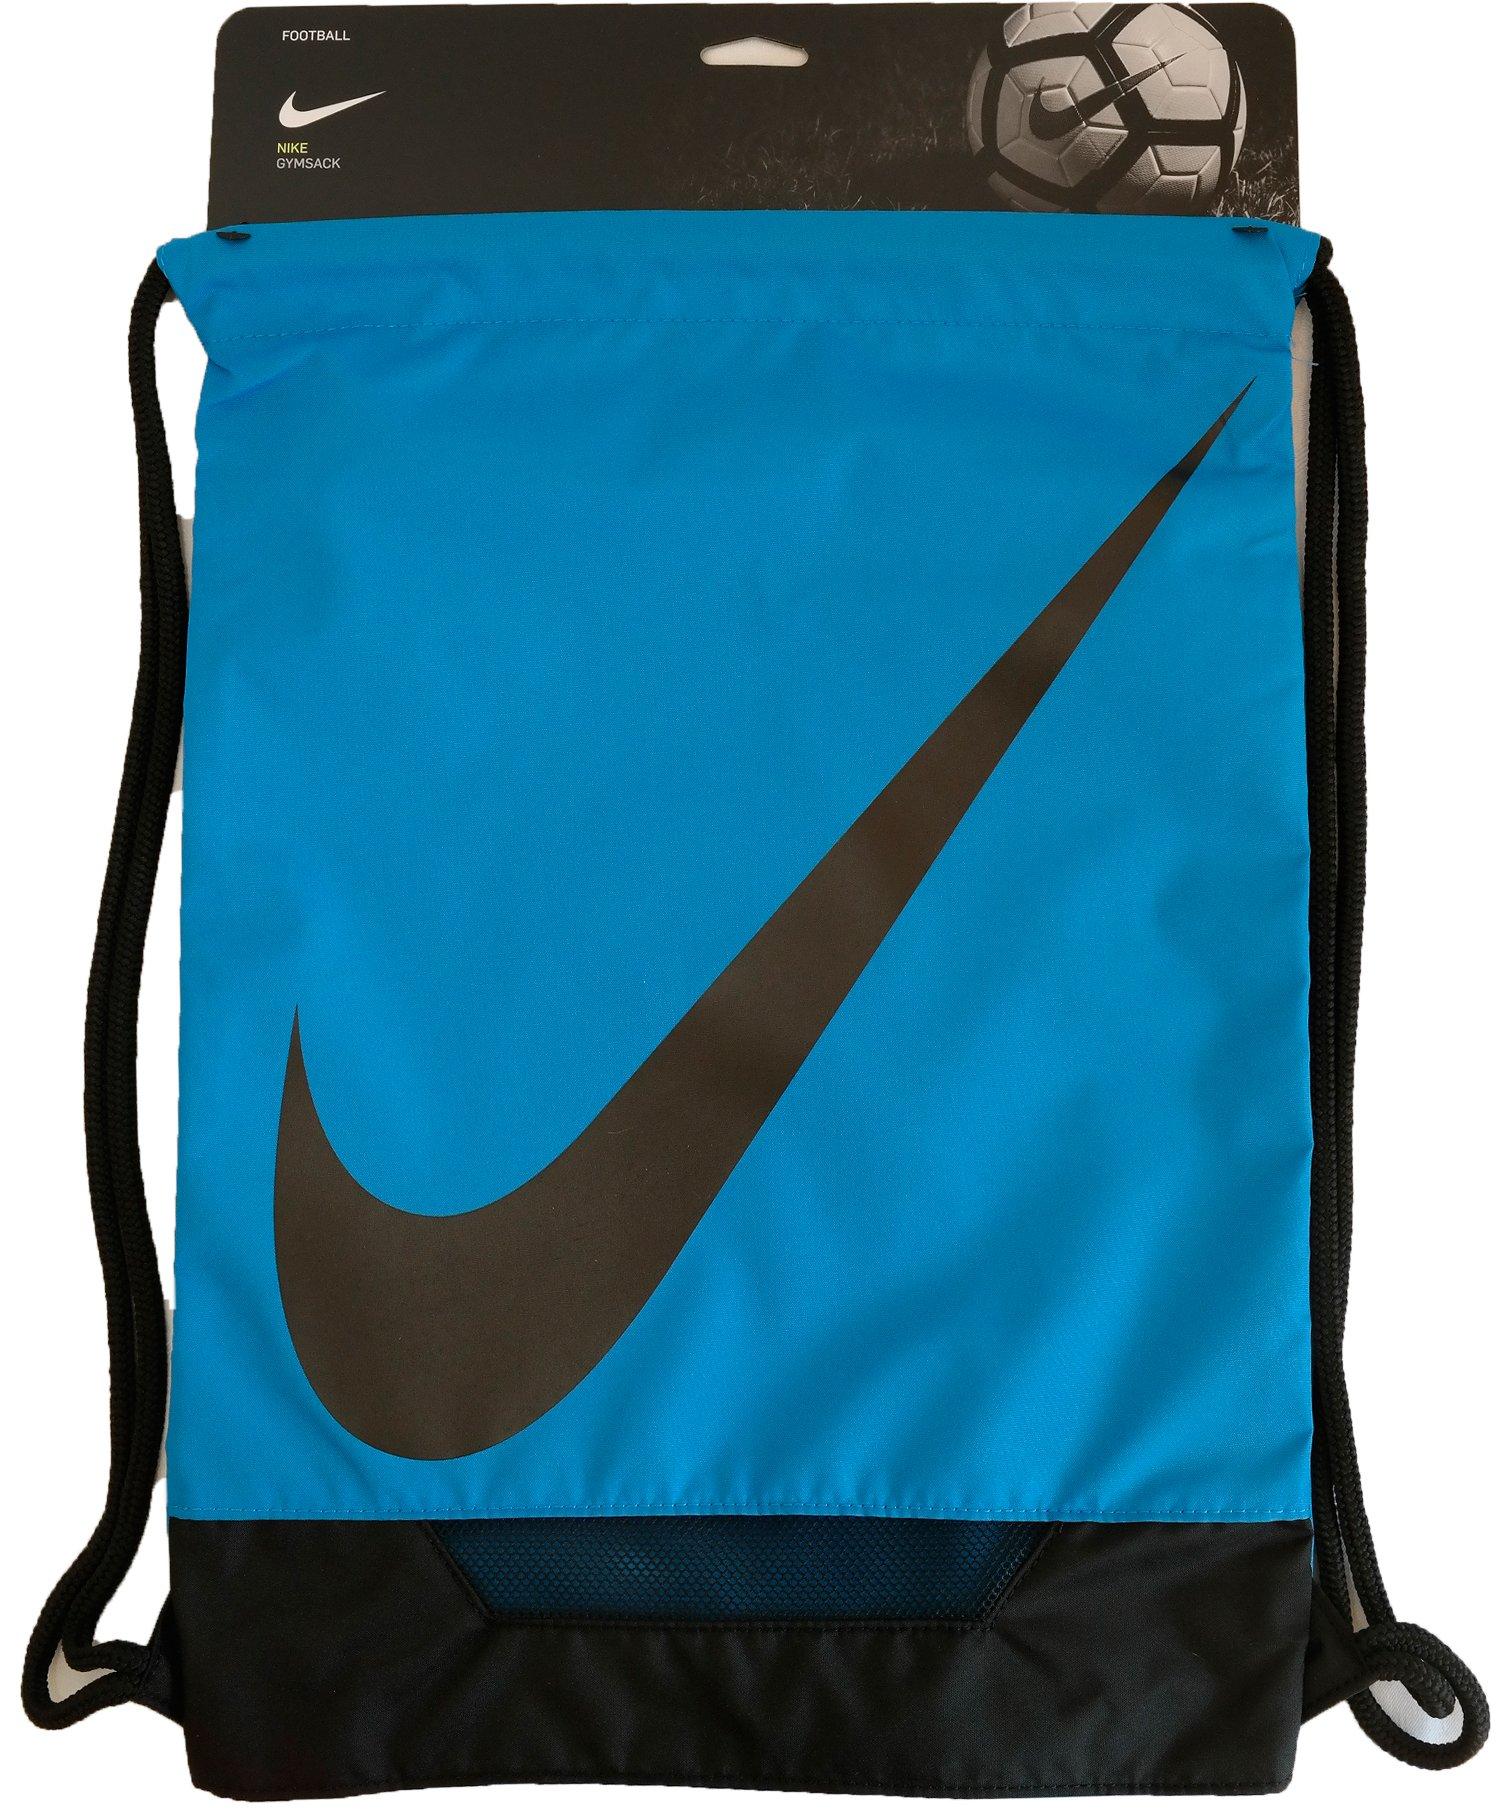 62c03f8dfae43 Nike Lekka Torba Plecak Worek Trening Szkoła Super, Worki AN-SPORT